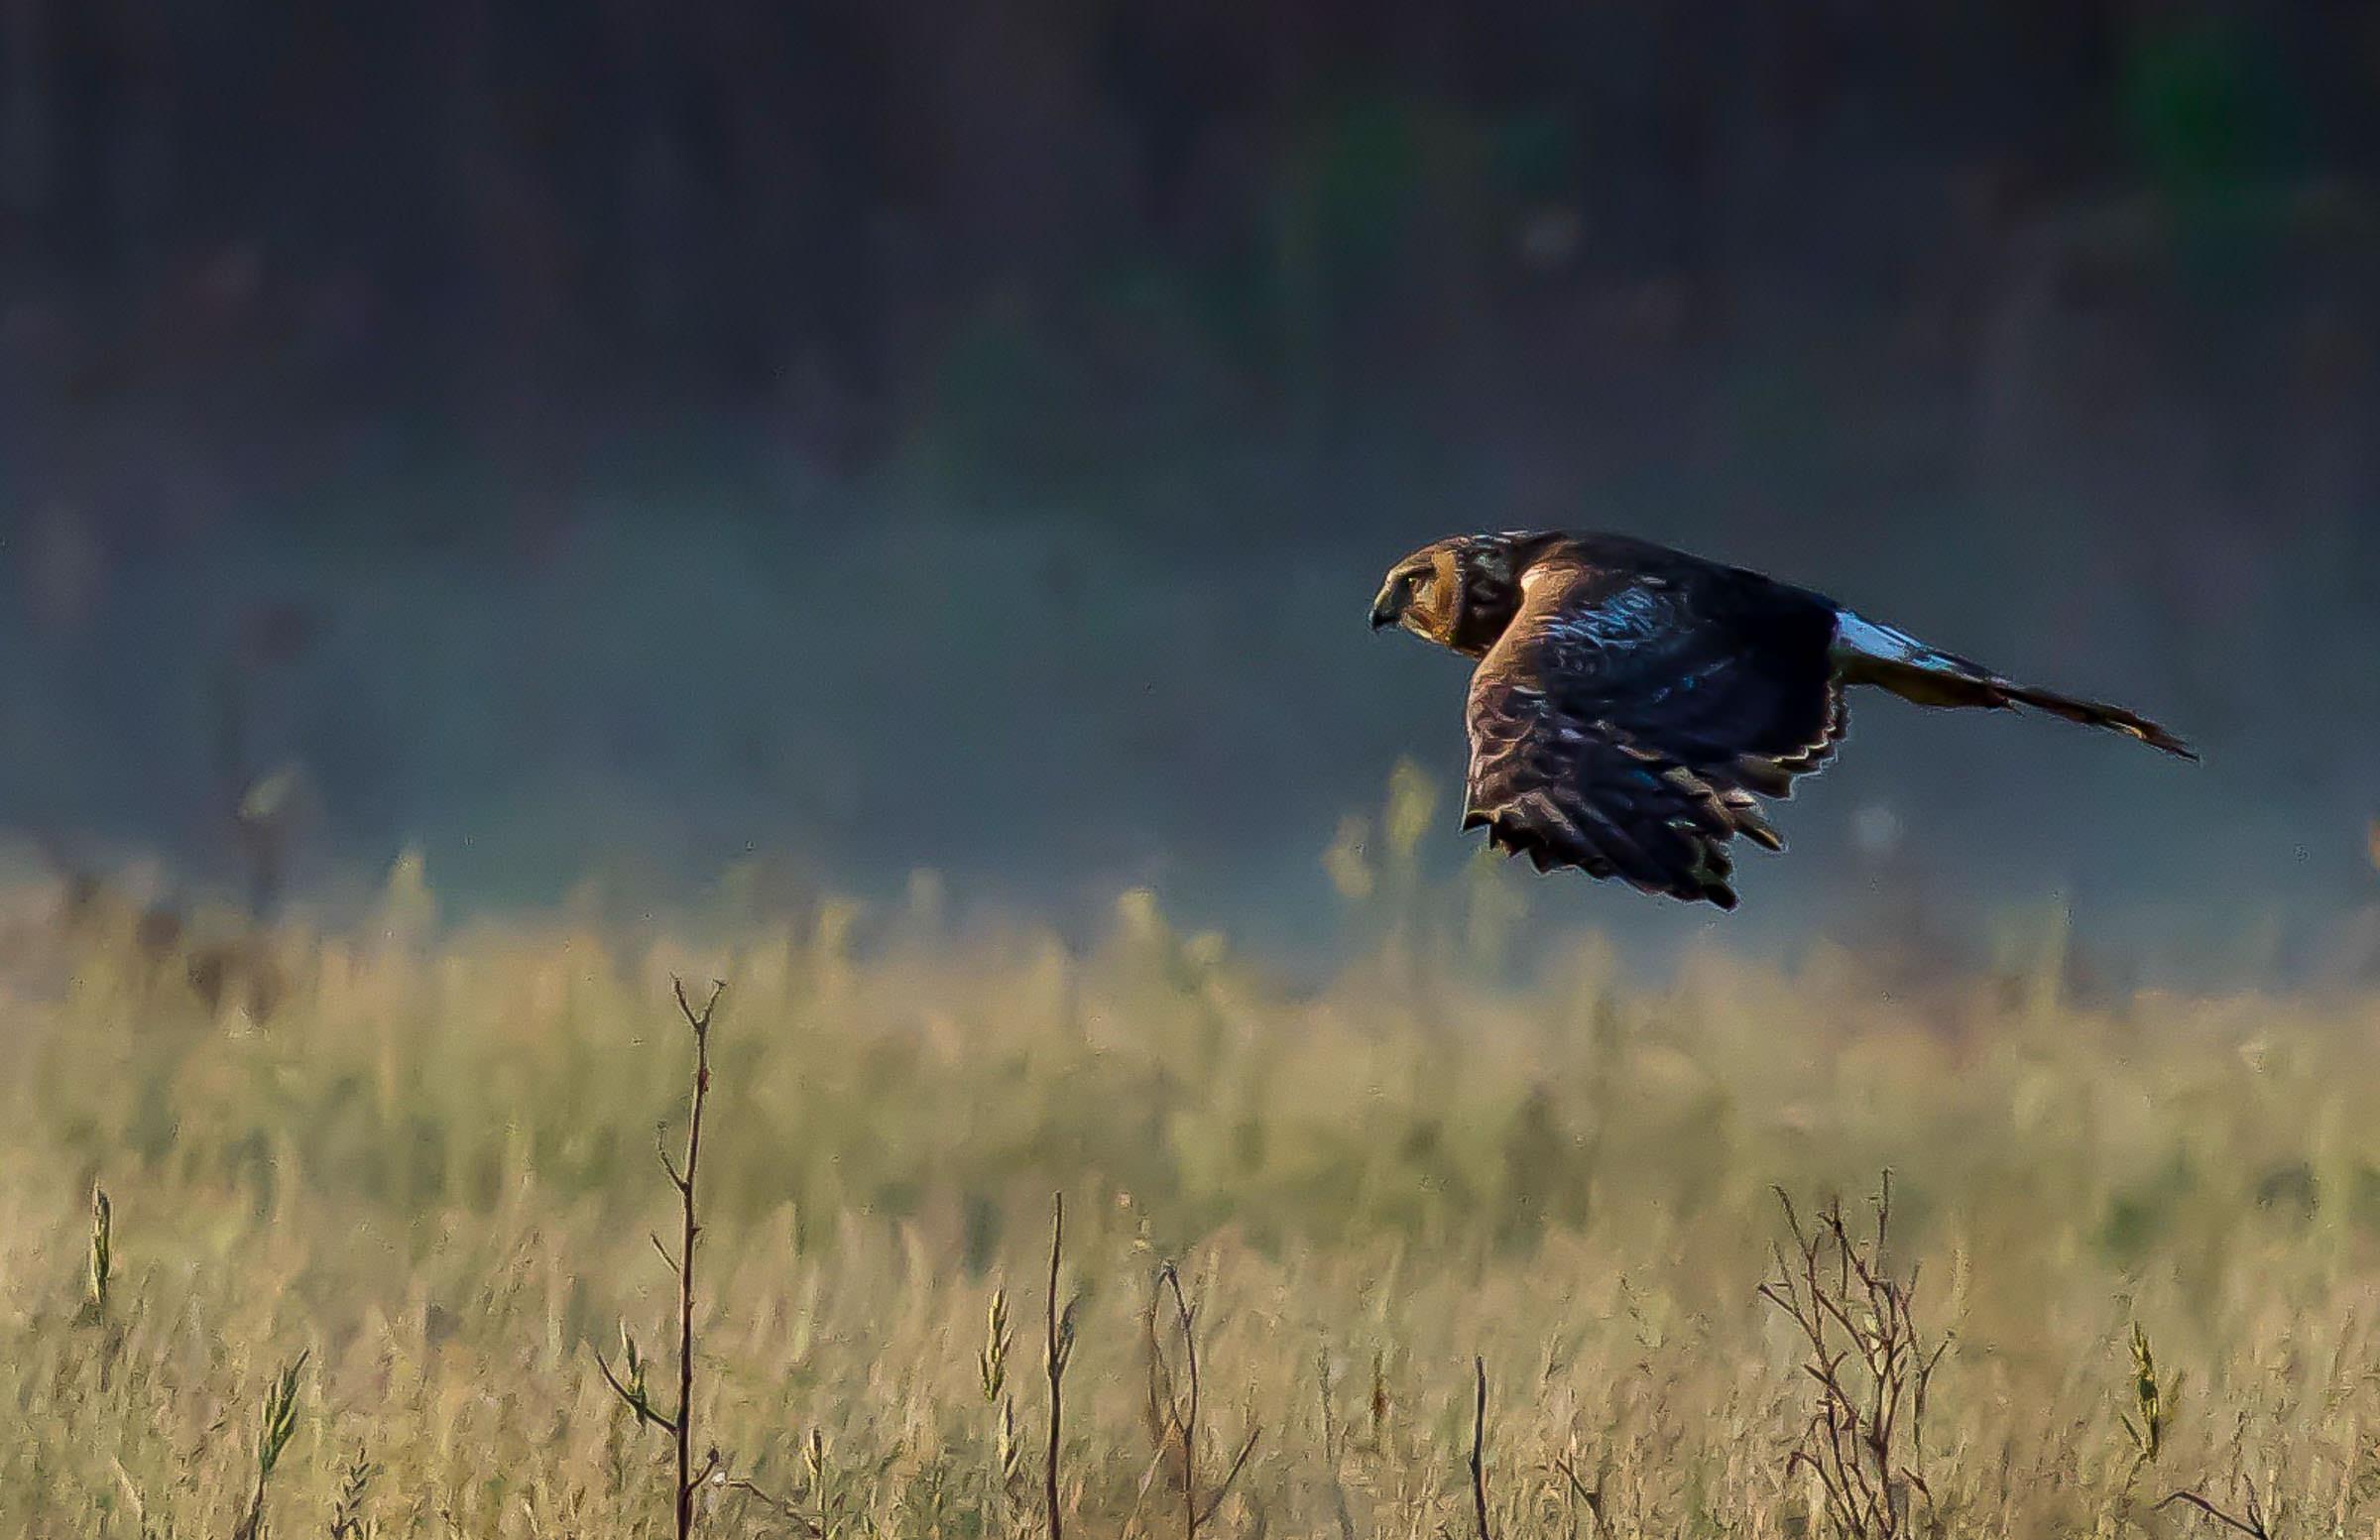 northern_harrier_hunting_jackrabbit-8.jpg